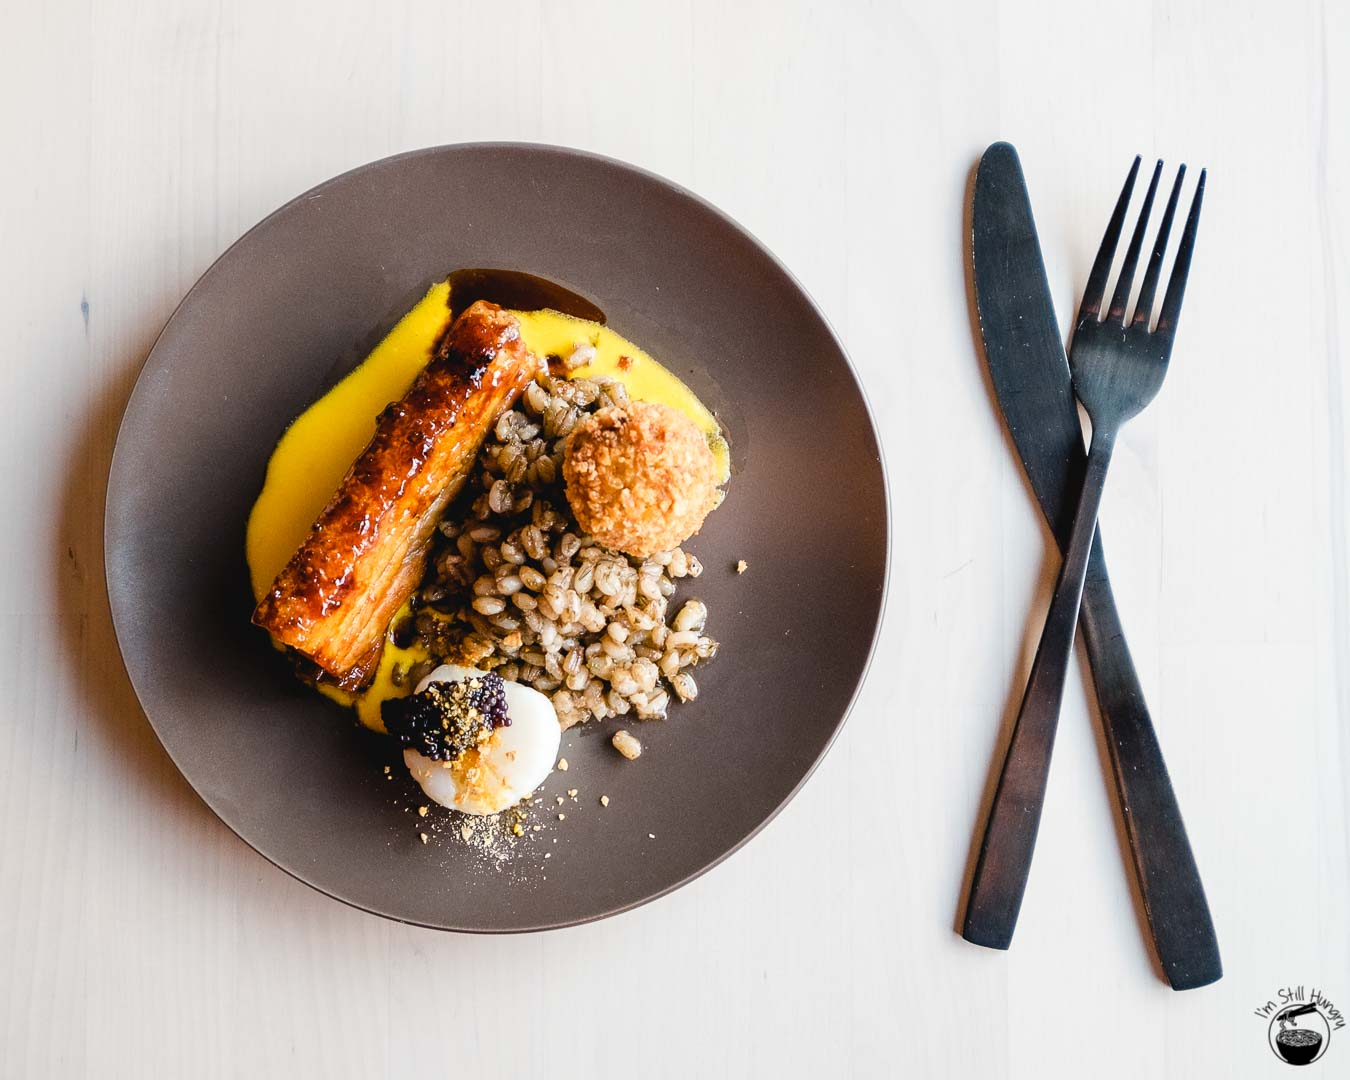 Blue Wren Restaurant Himalayan rock salt seared scallop, pork belly, sage thyme barley, caviar, corn dust, pork neck croquette, crustacean curd